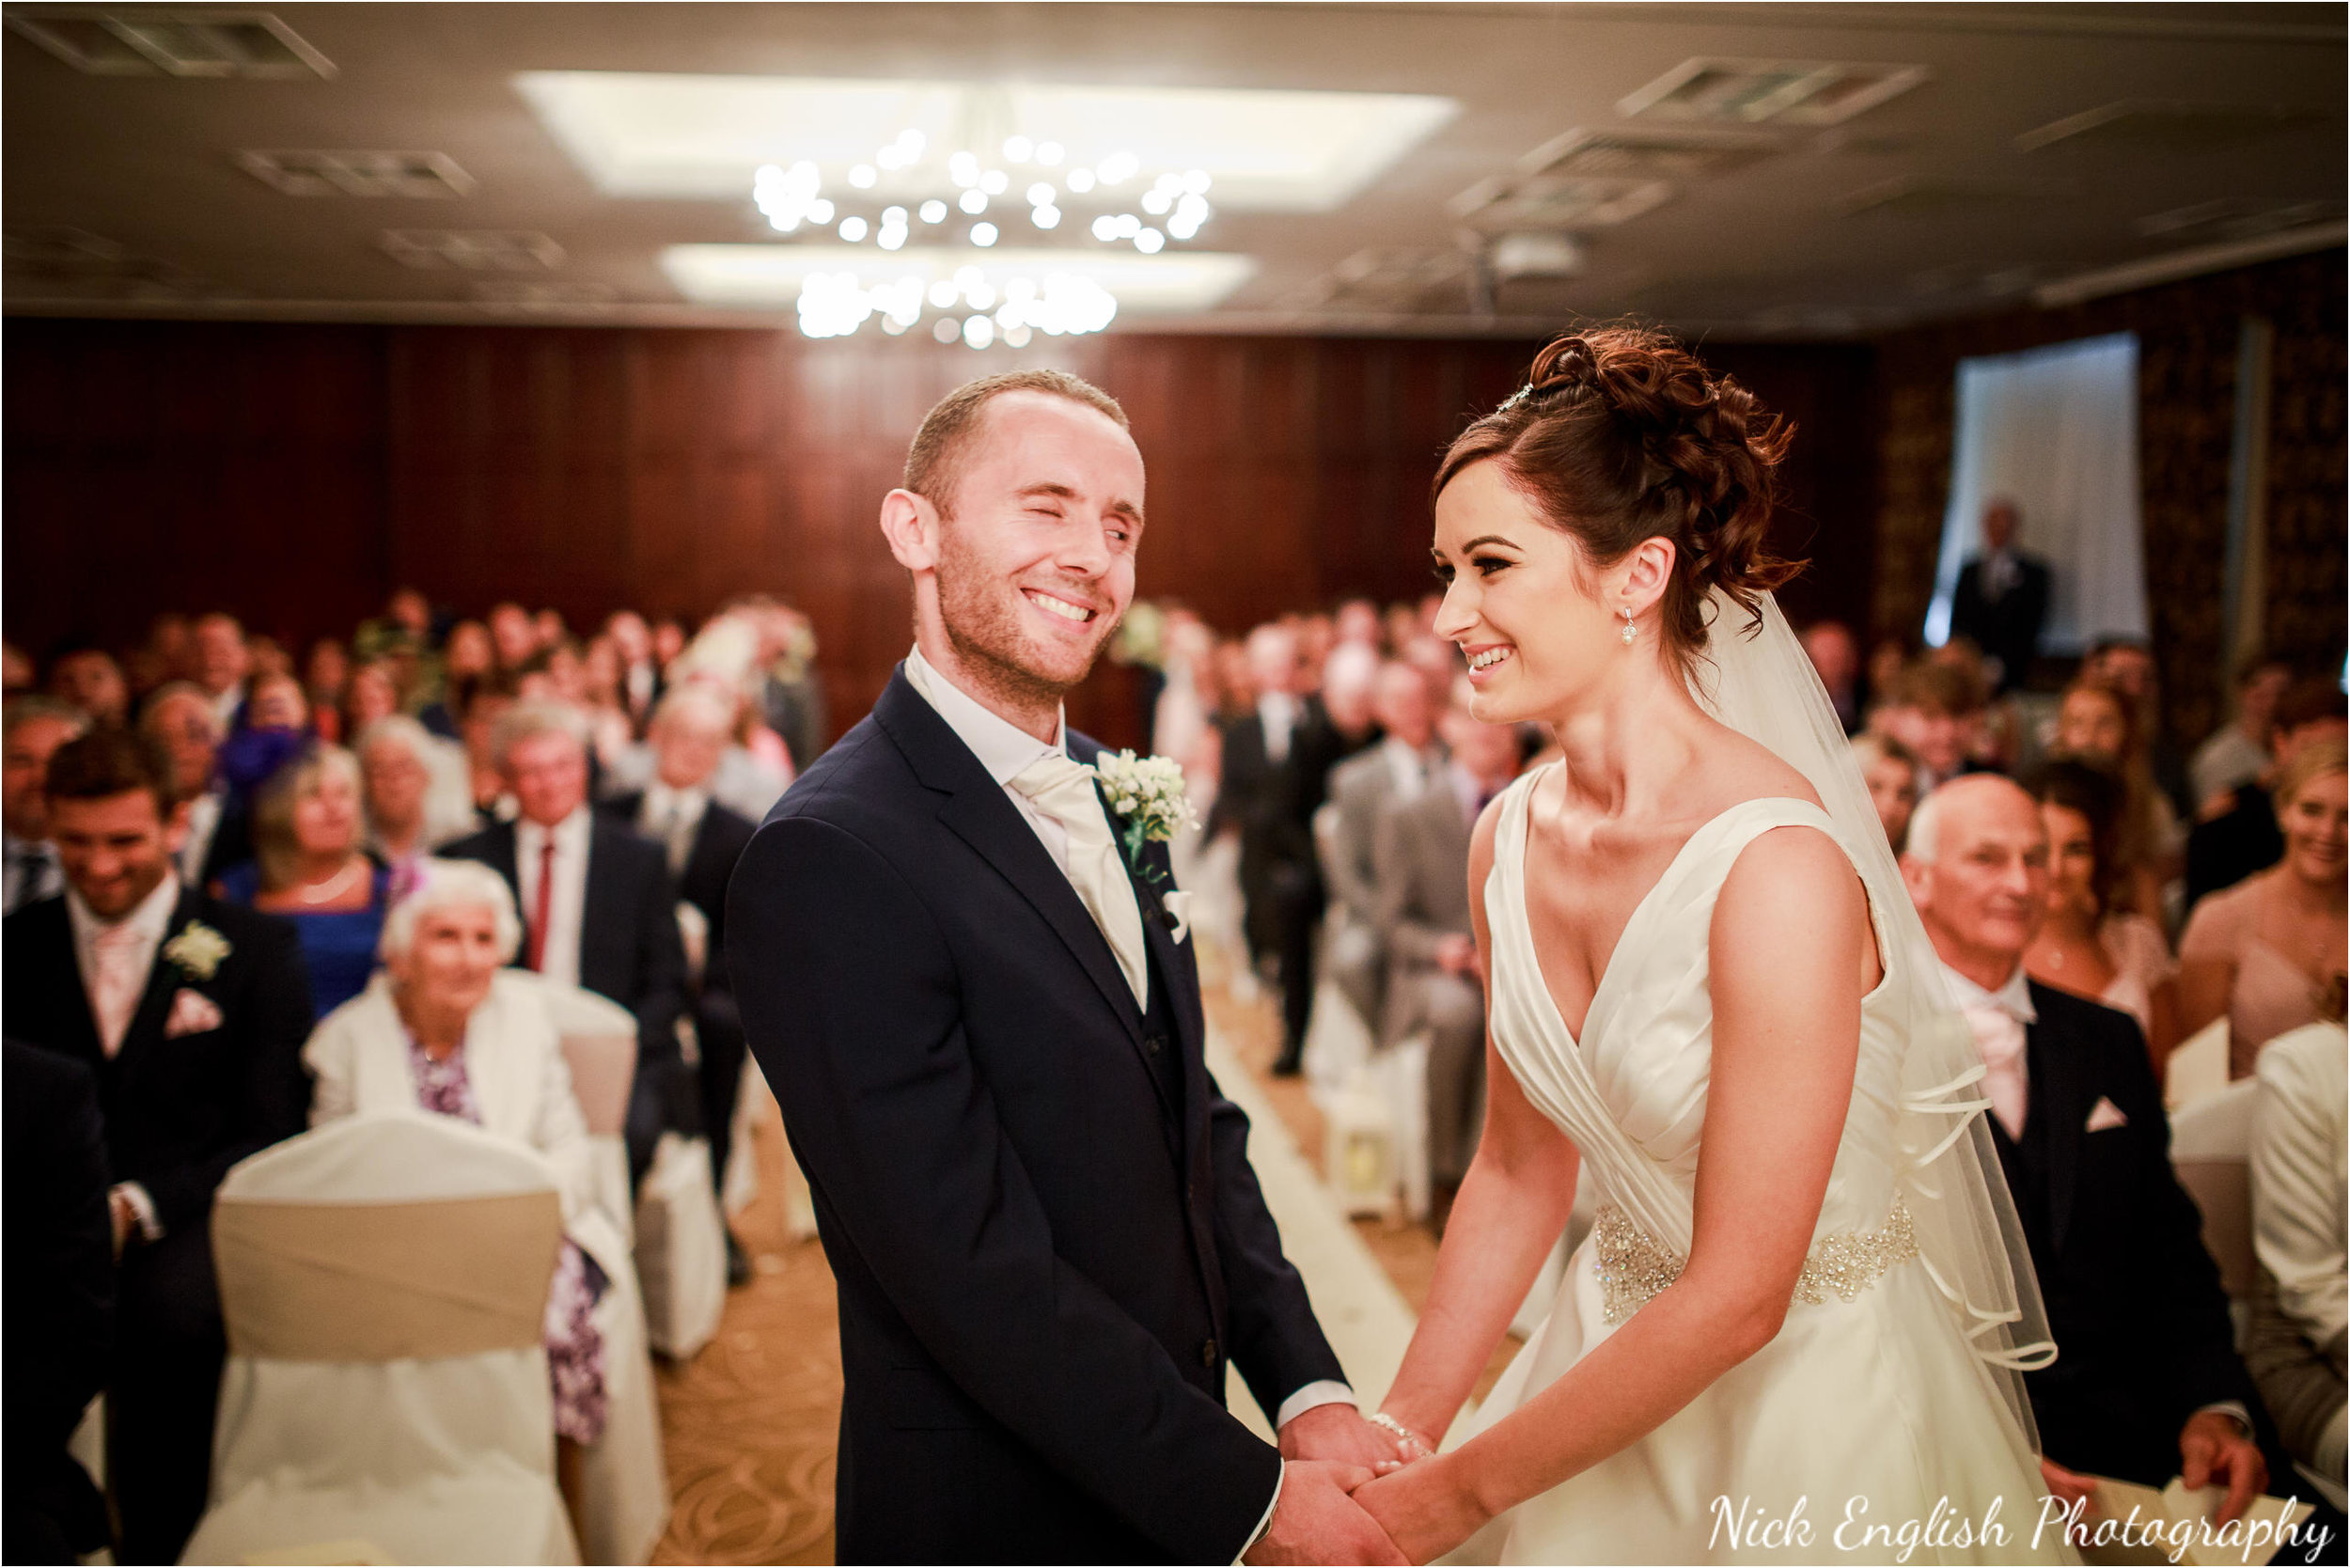 Emily David Wedding Photographs at Barton Grange Preston by Nick English Photography 64jpg.jpeg